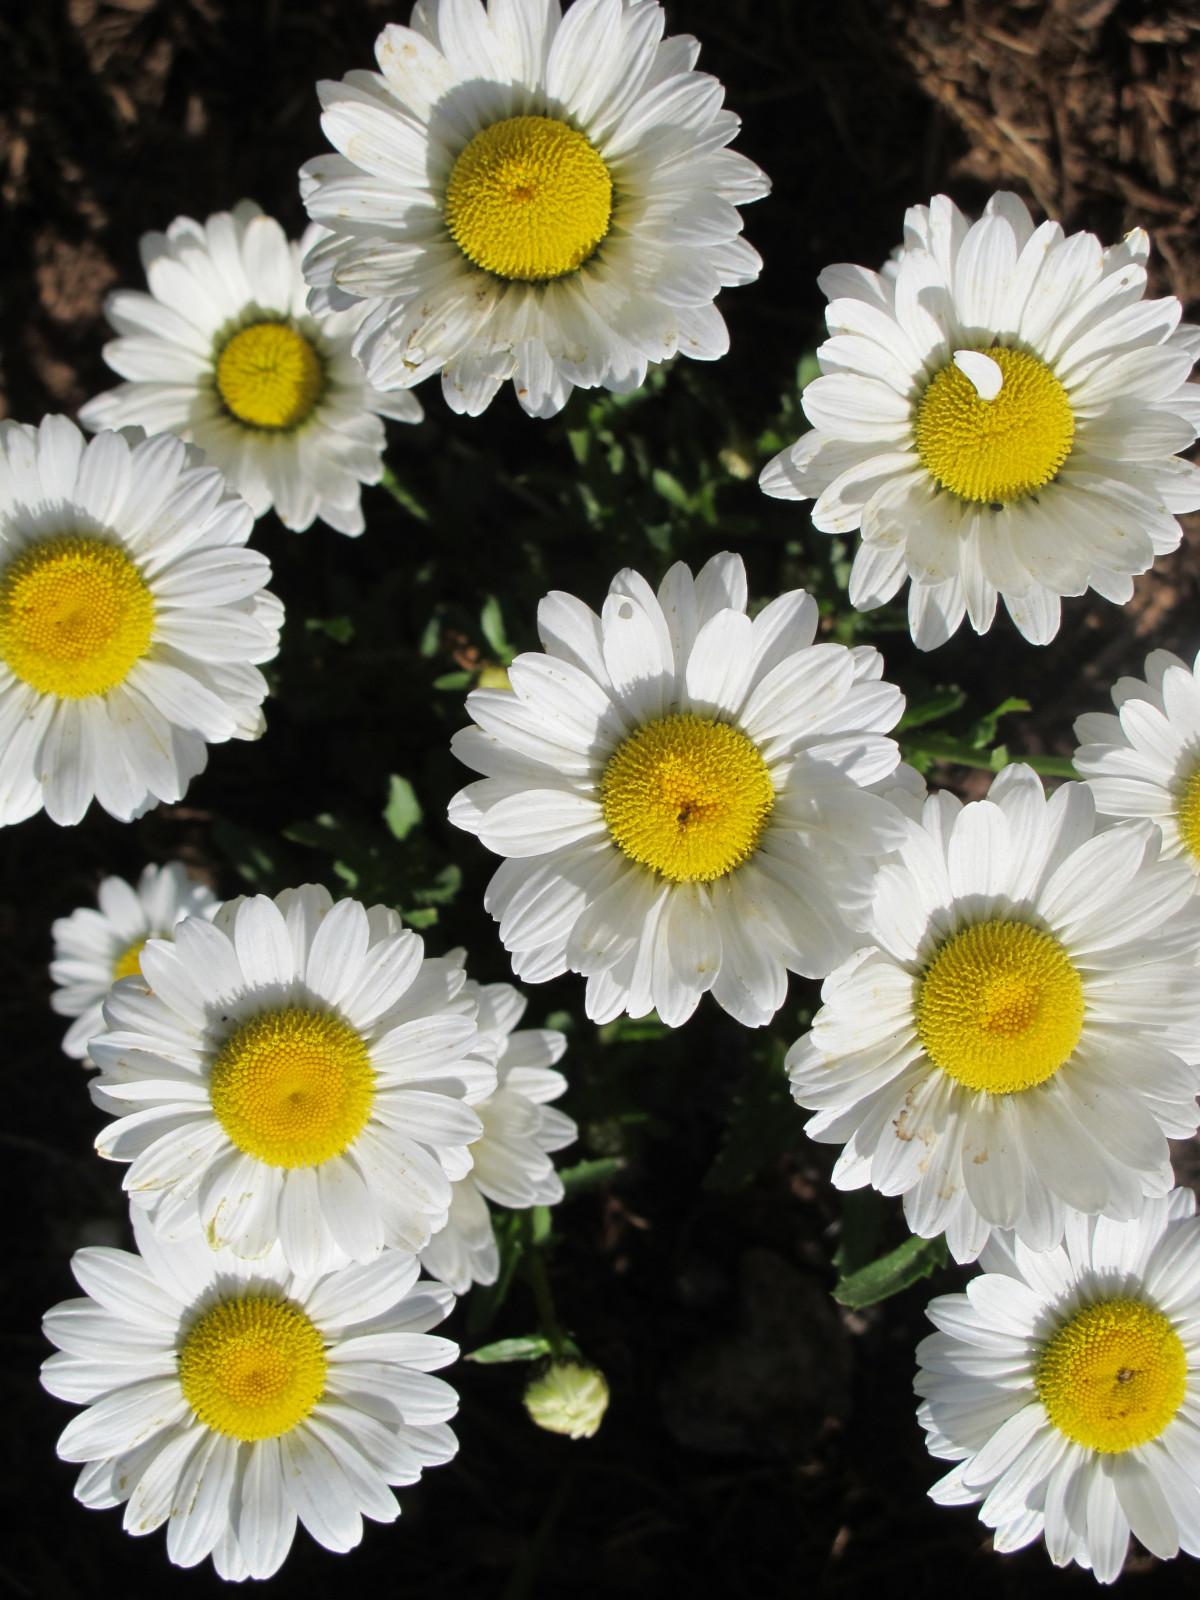 Free Images : nature, petal, bloom, colorful, flora ...